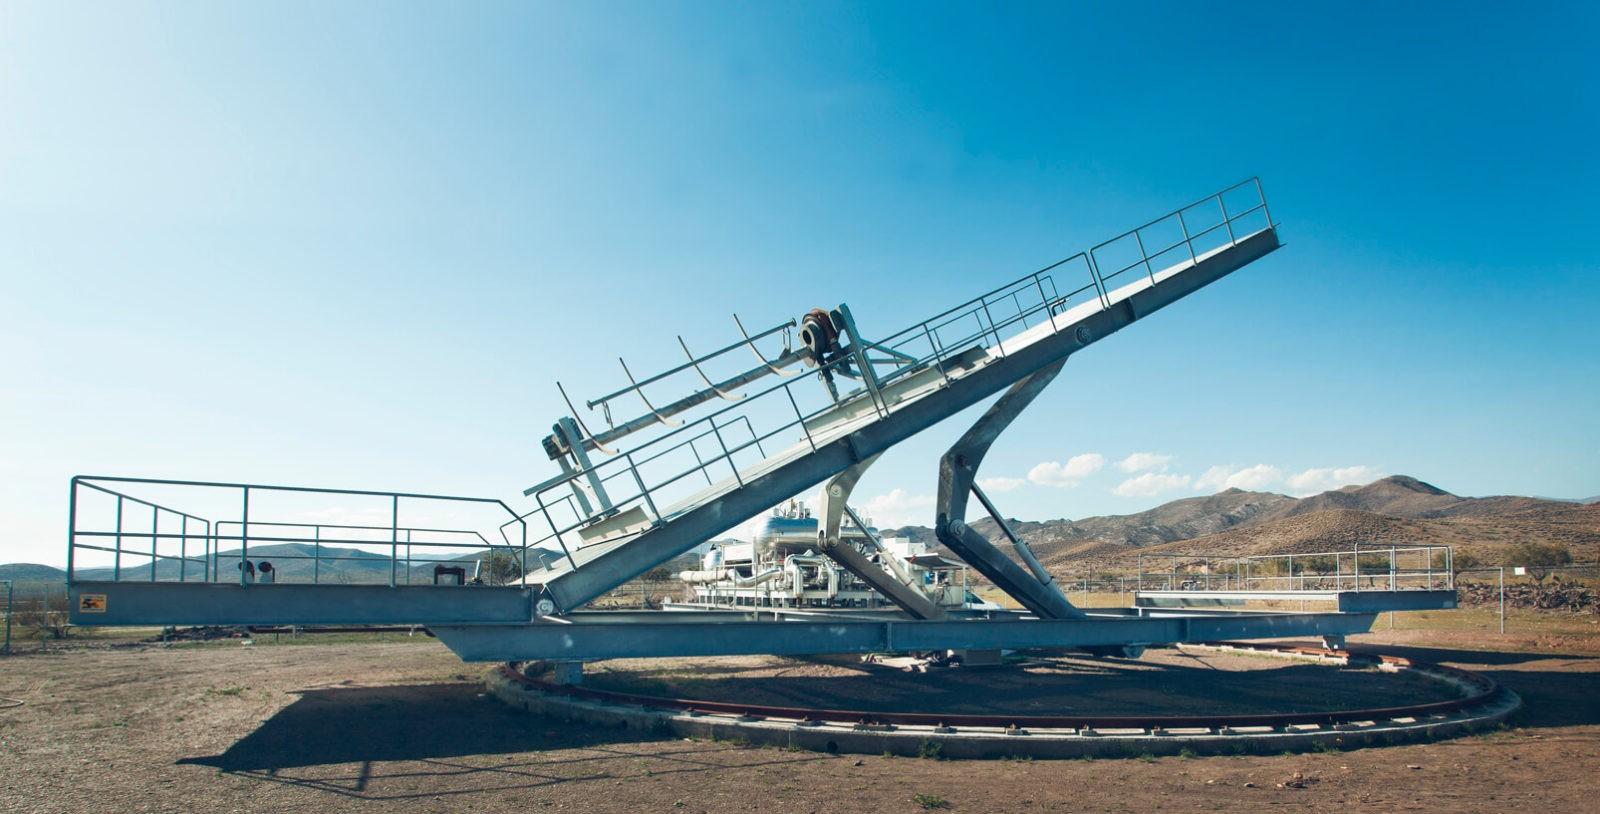 CTAER_Solar_Parabollic_Through_Collectors_Test_Platform_Alemara_ADA_IDOM_Alfonso_Calza__1_